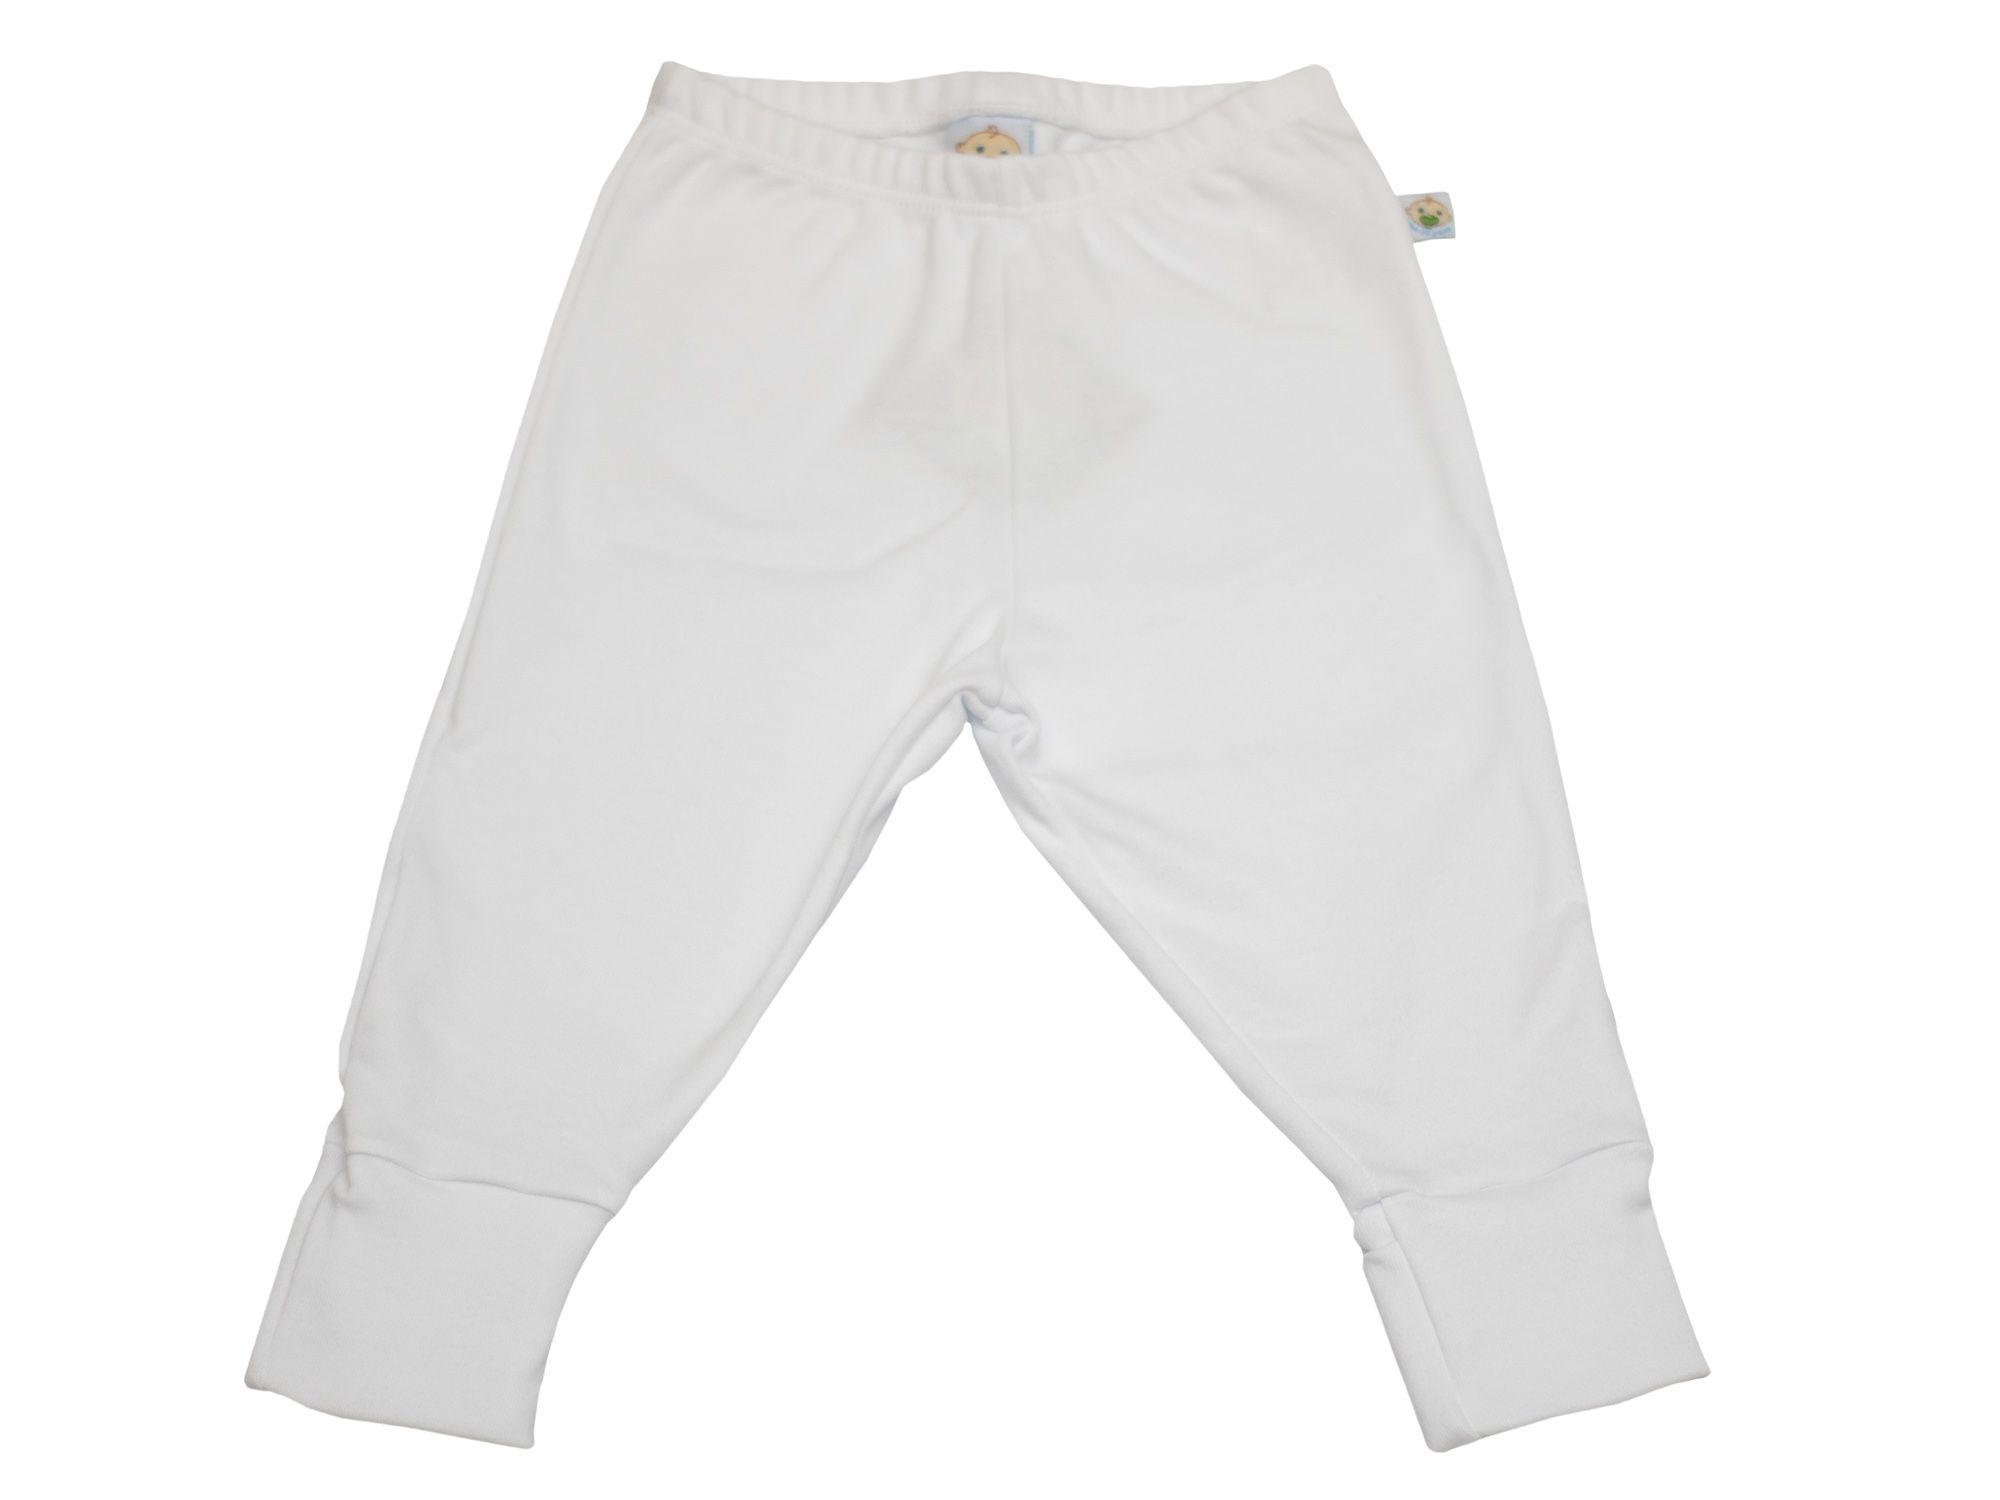 Calça Branco Vira Pé